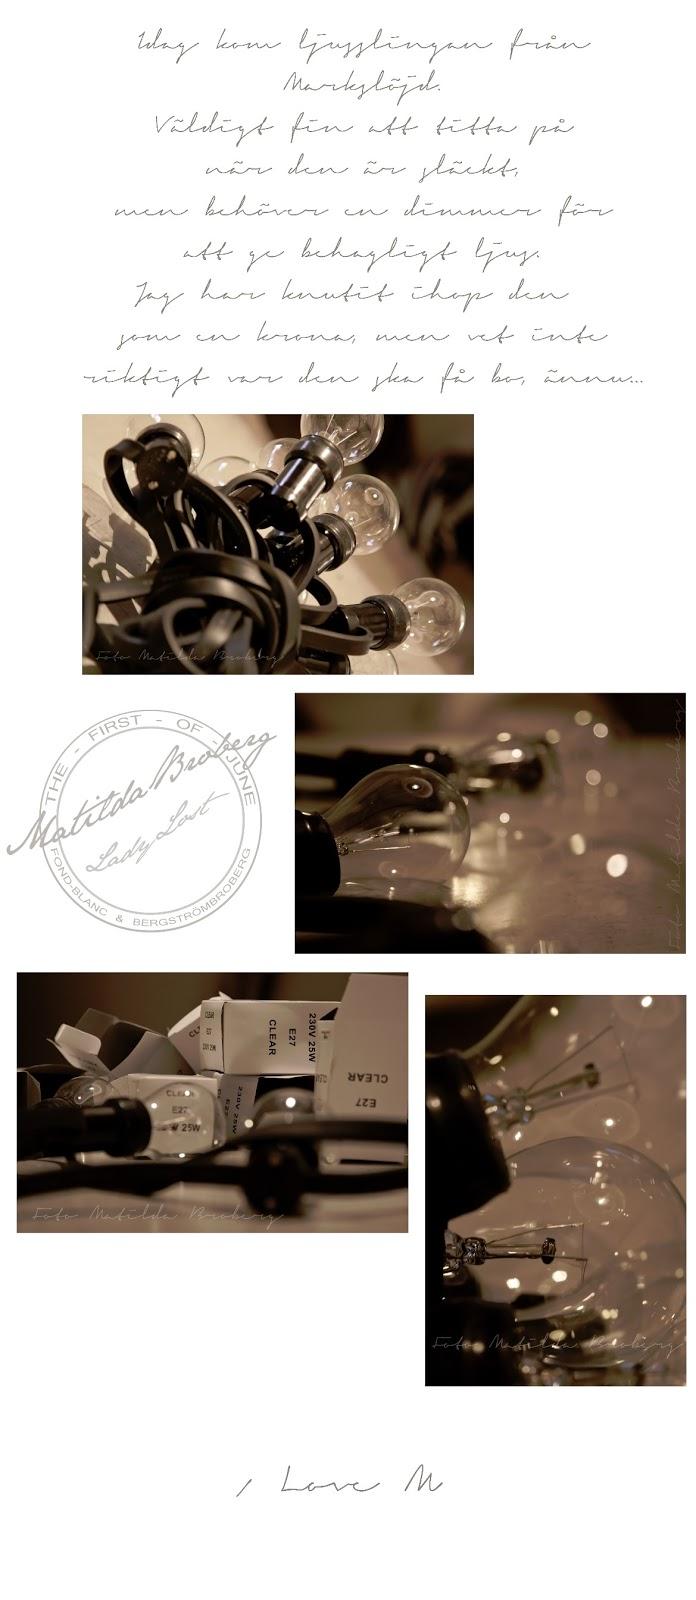 ljusslinga glödlampor svartvit inredning matilda broberg foto fotograf ladylost